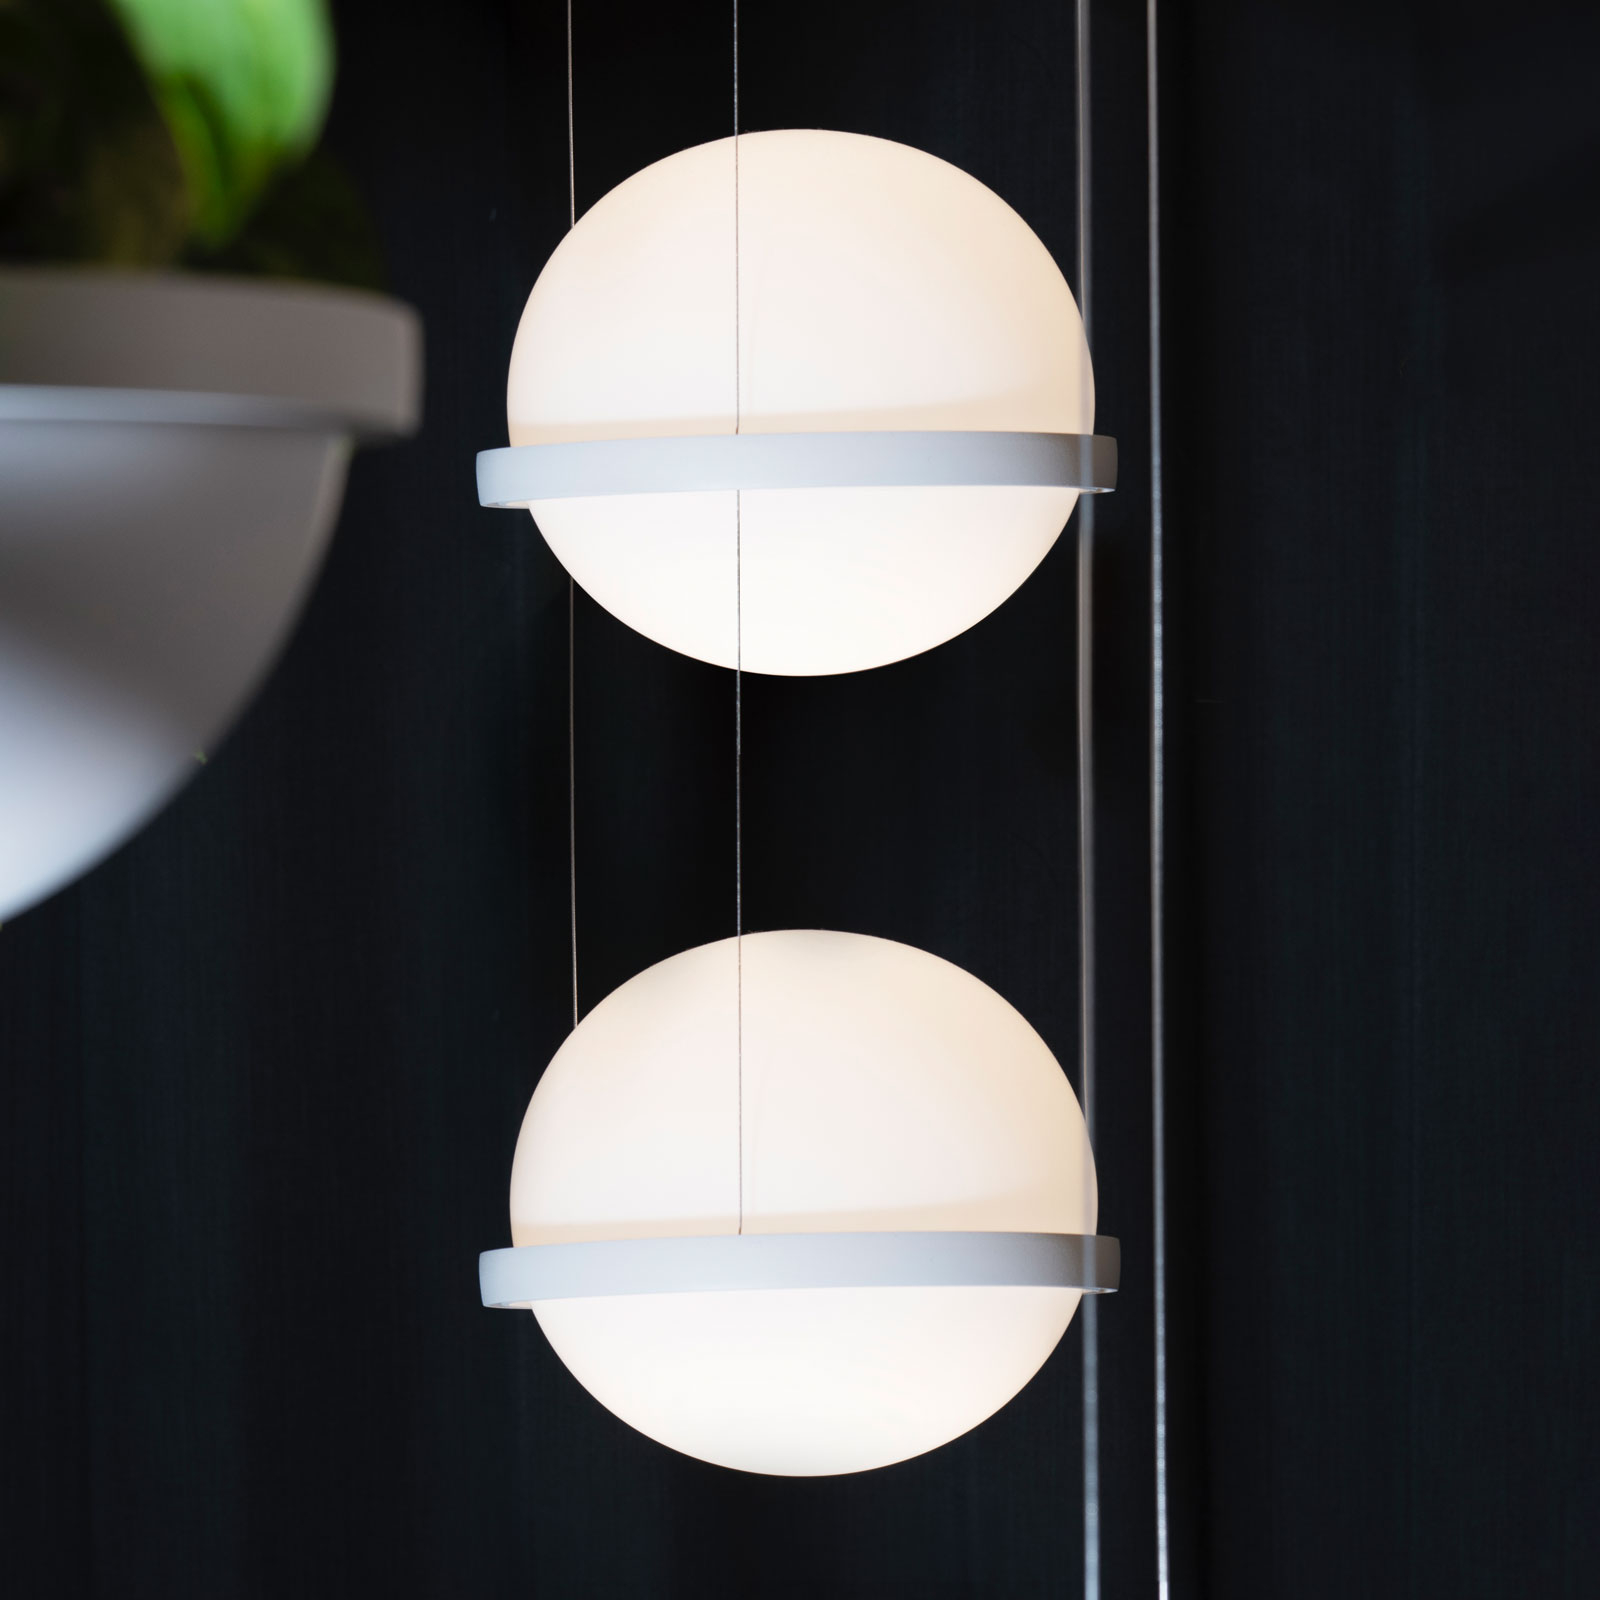 Vibia Palma 3726 lampa wisząca LED, 2-pkt., biała